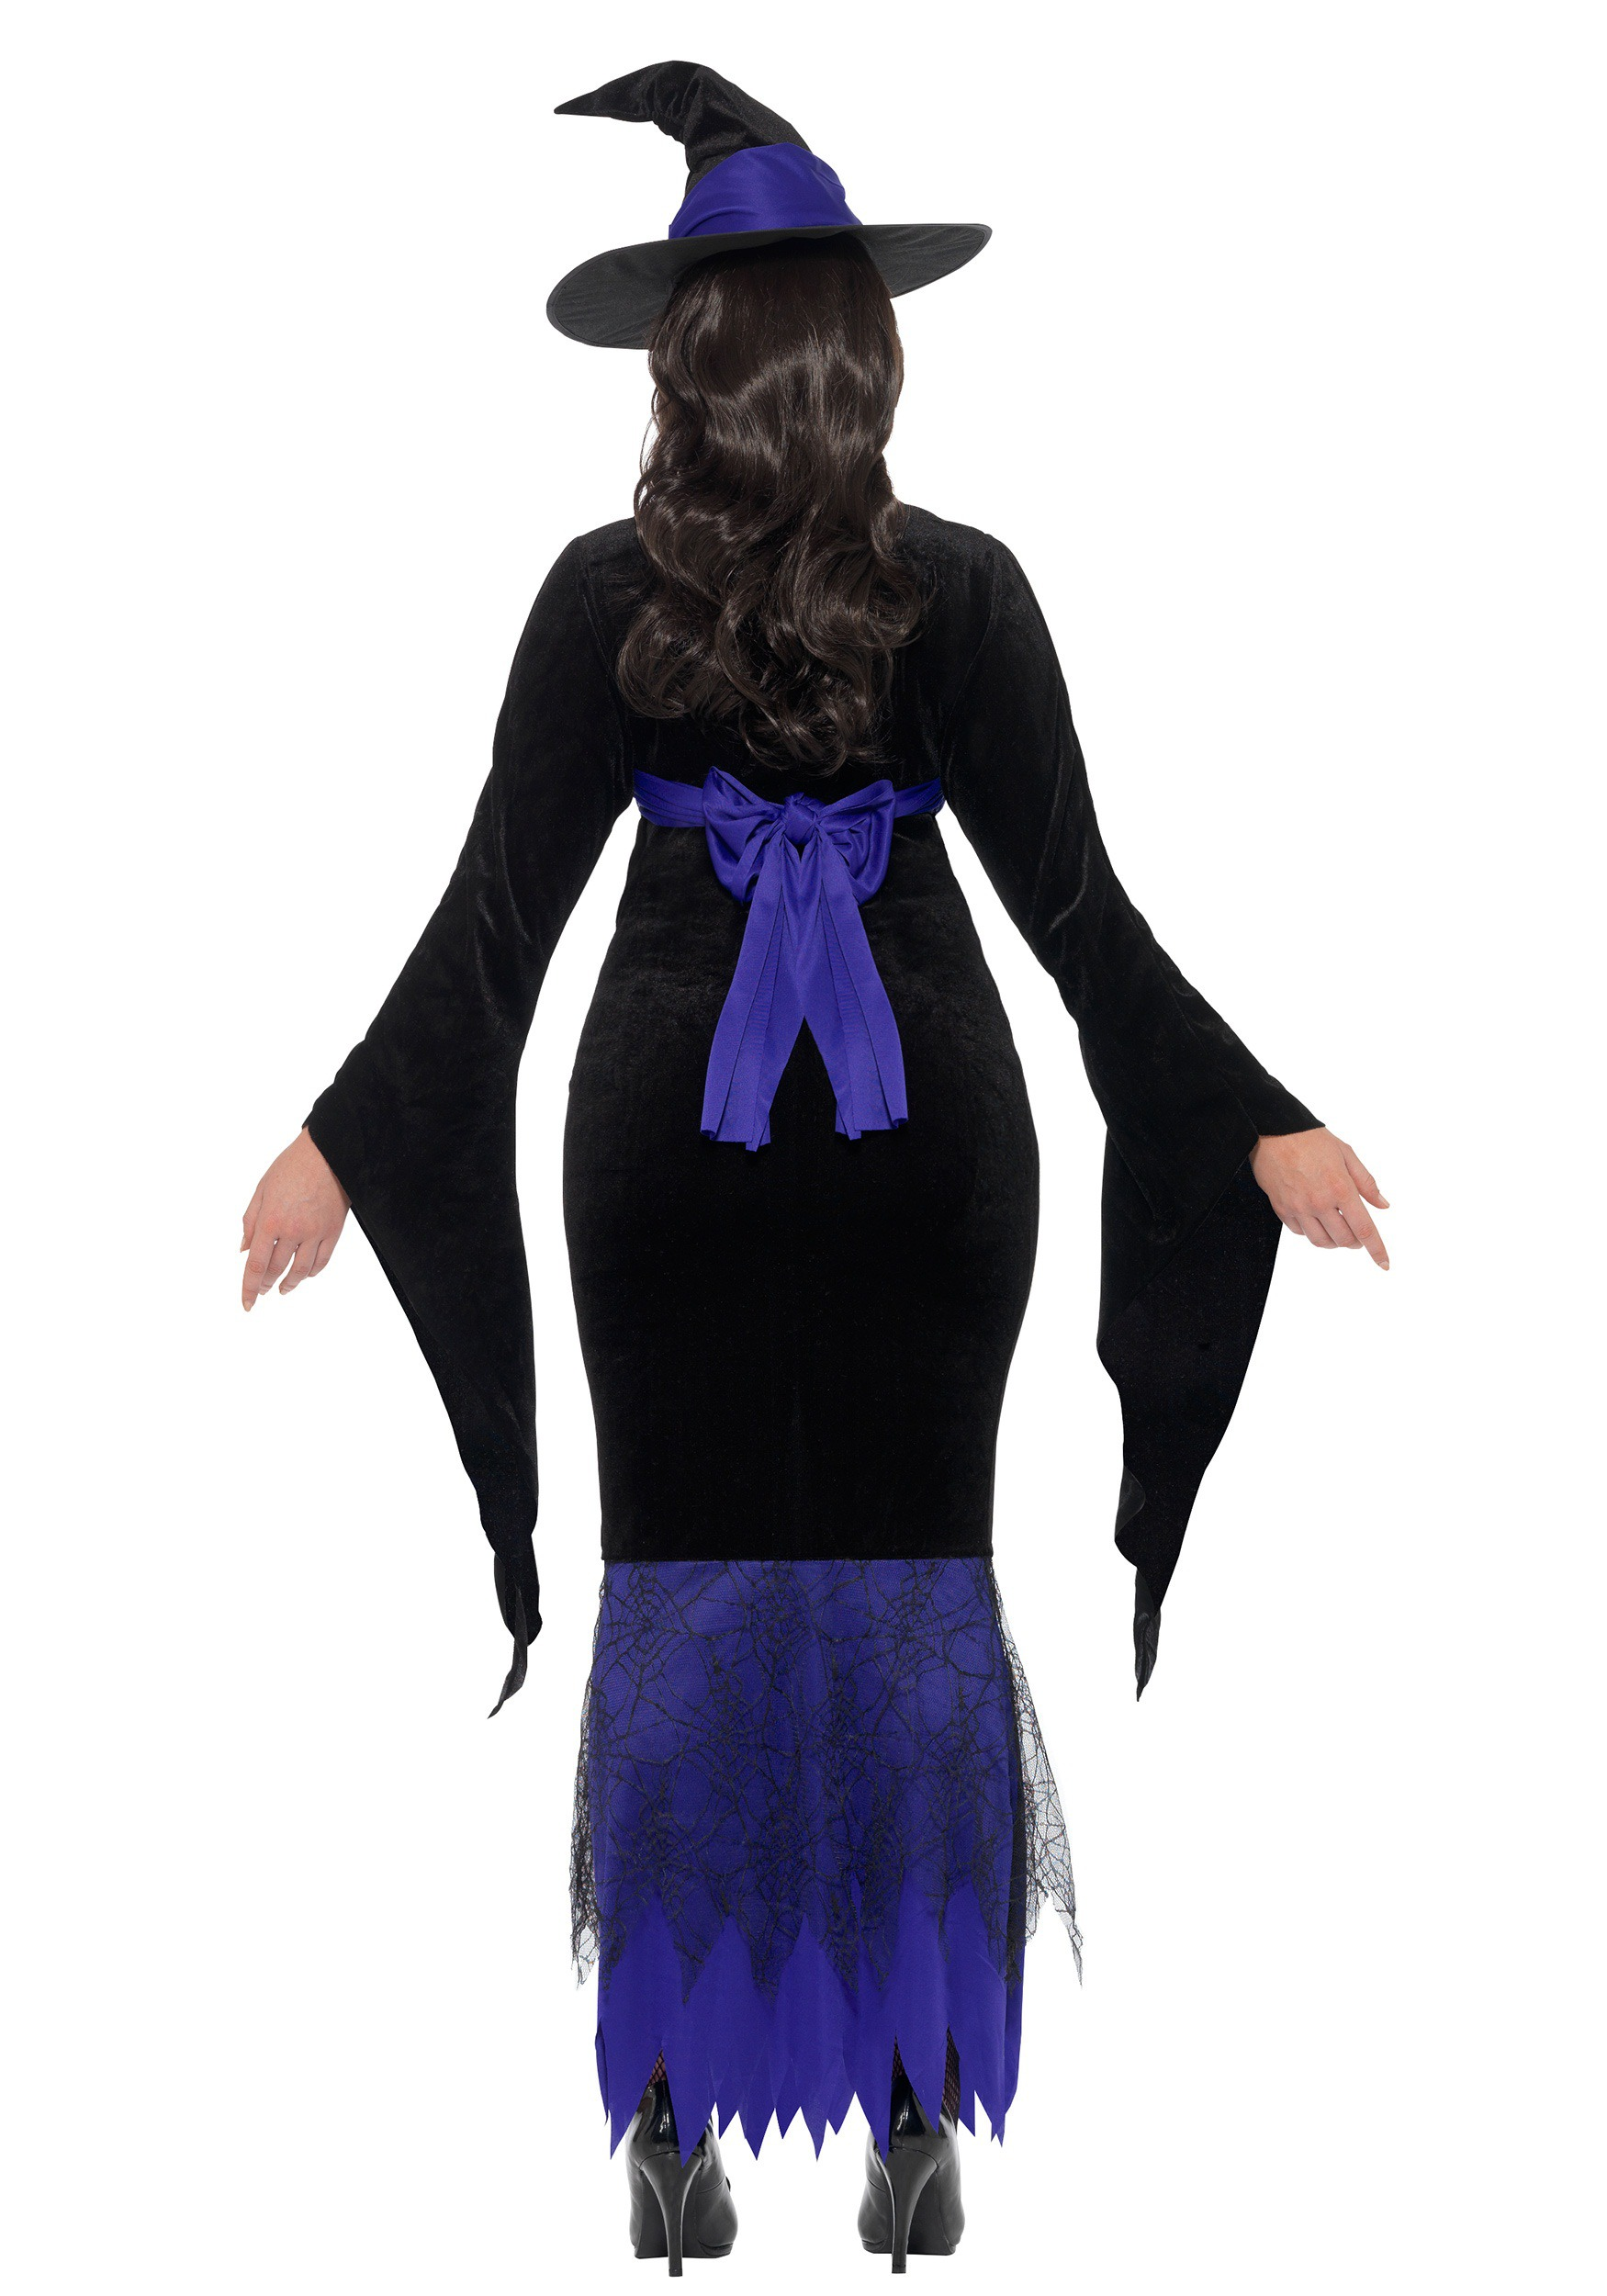 Women's Plus Size Glamorous Witch Costume